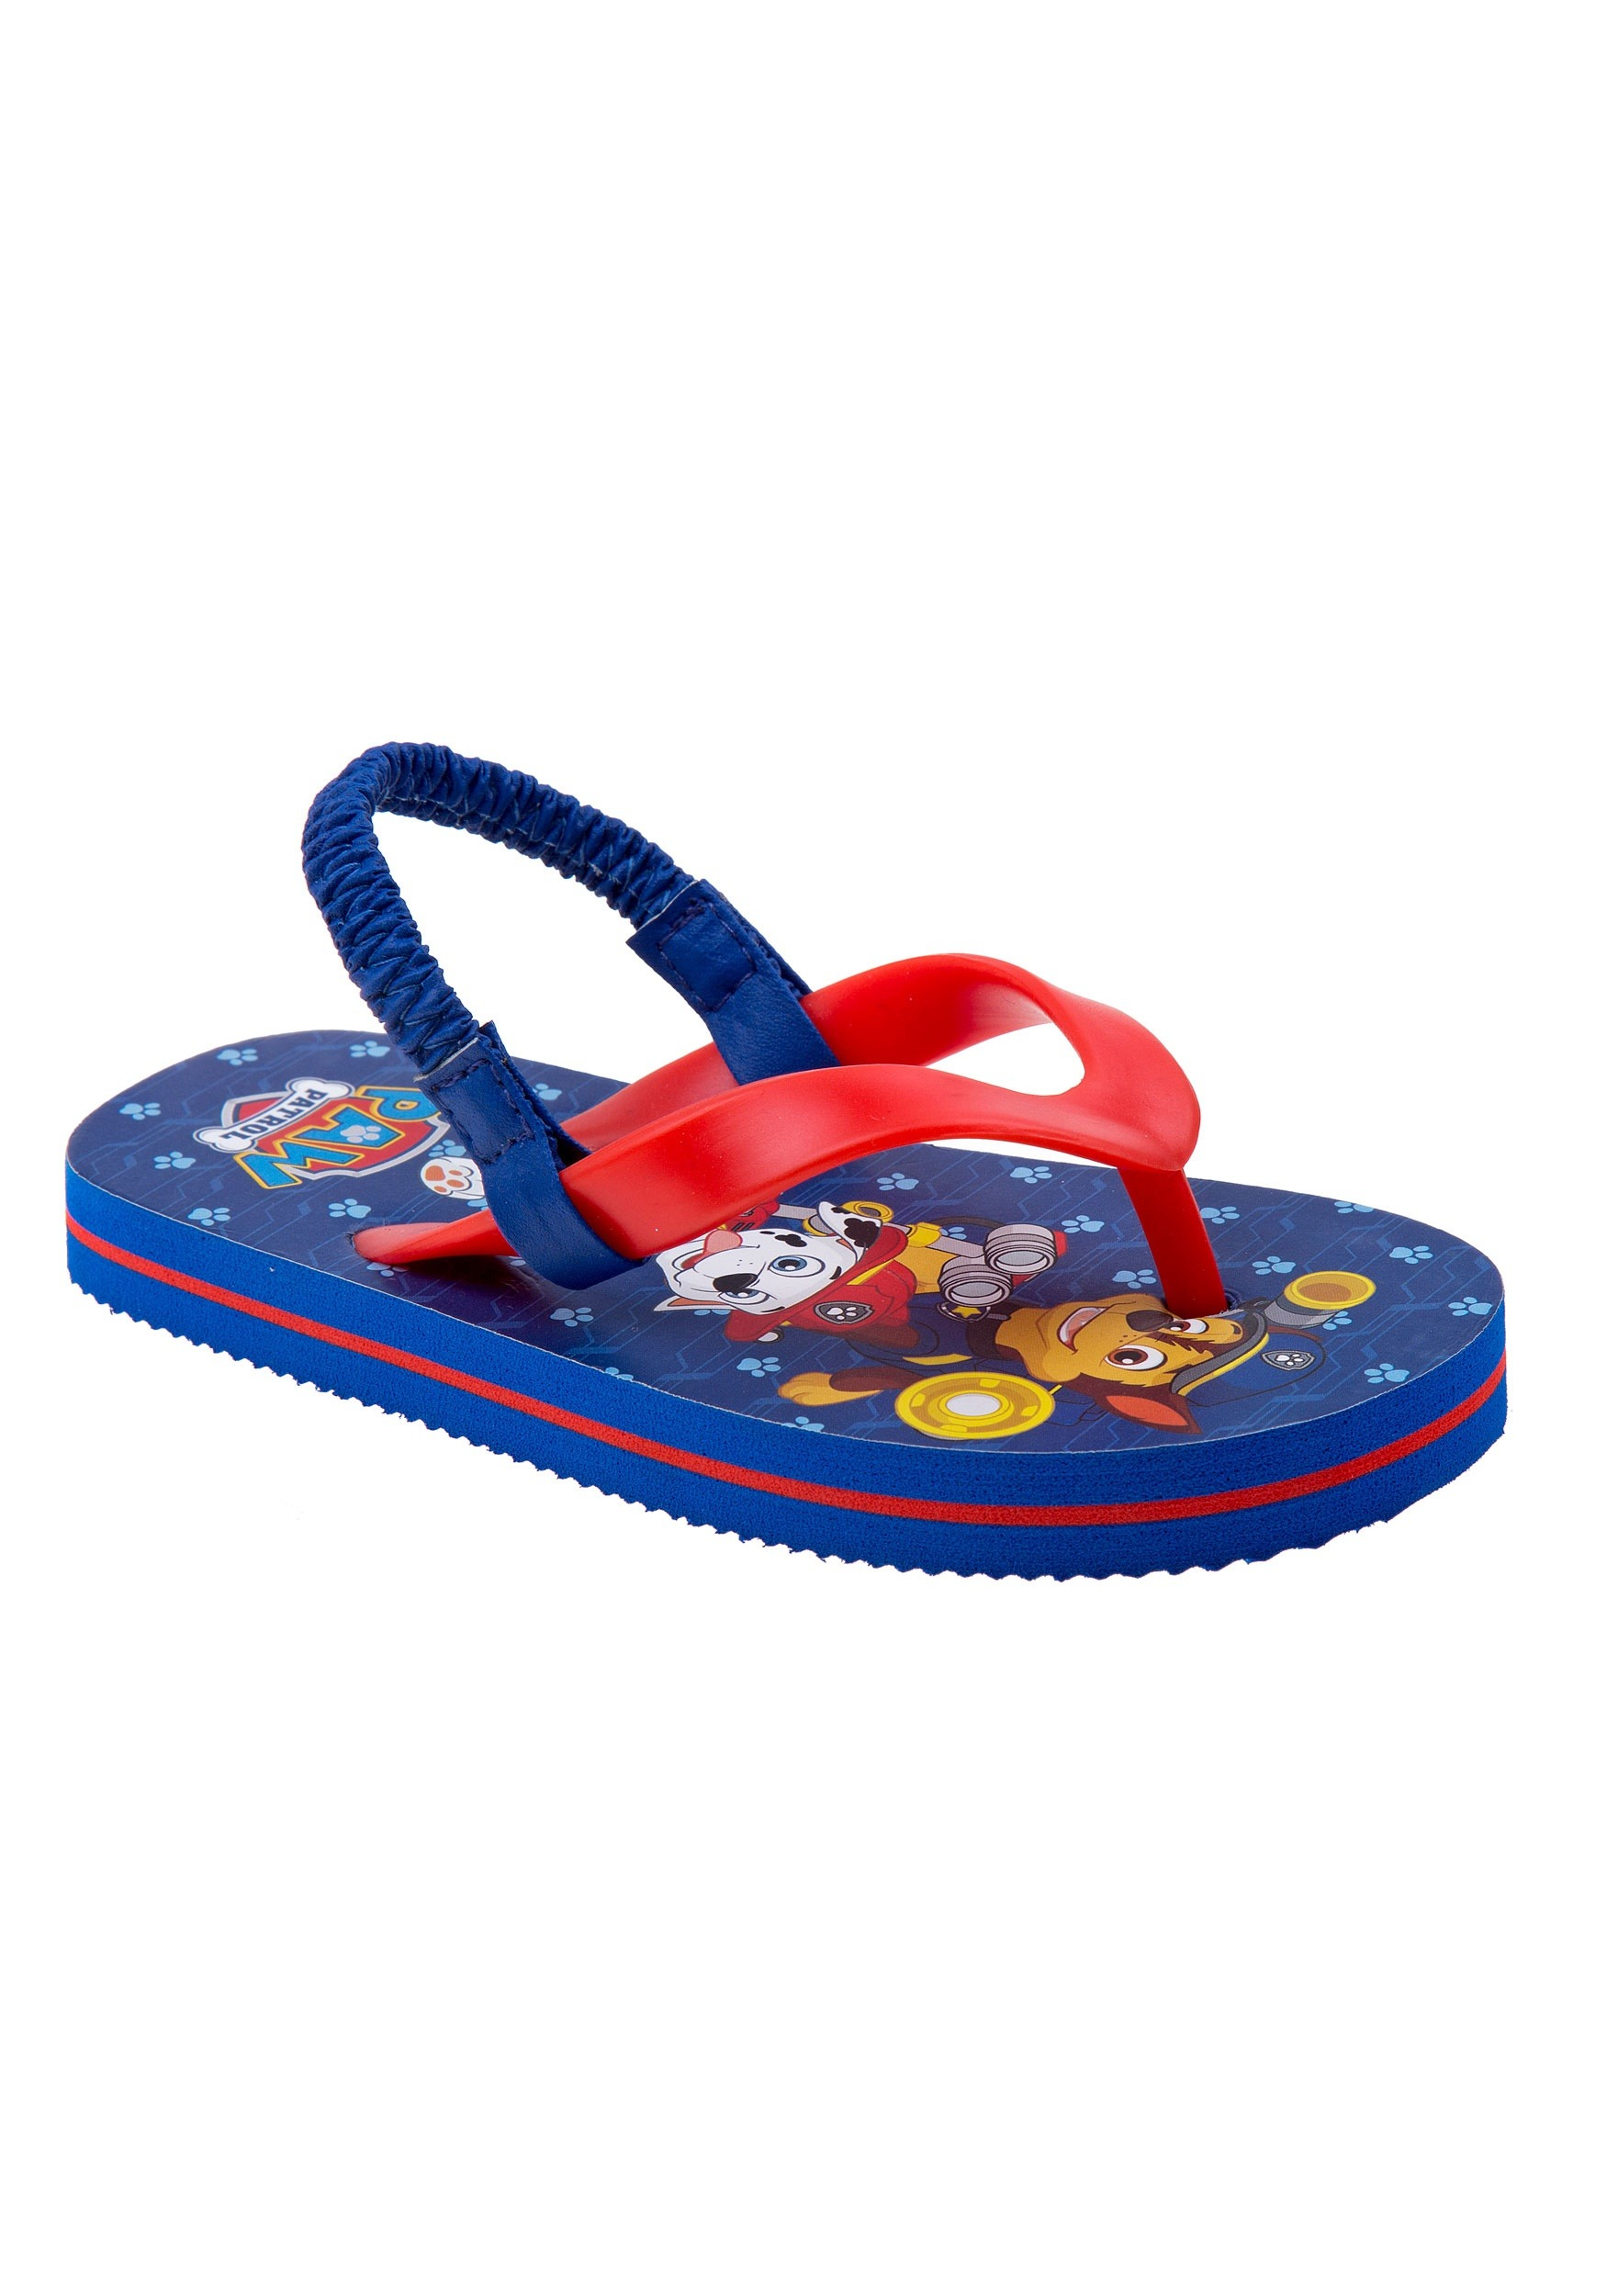 Paw Patrol Child Sandals